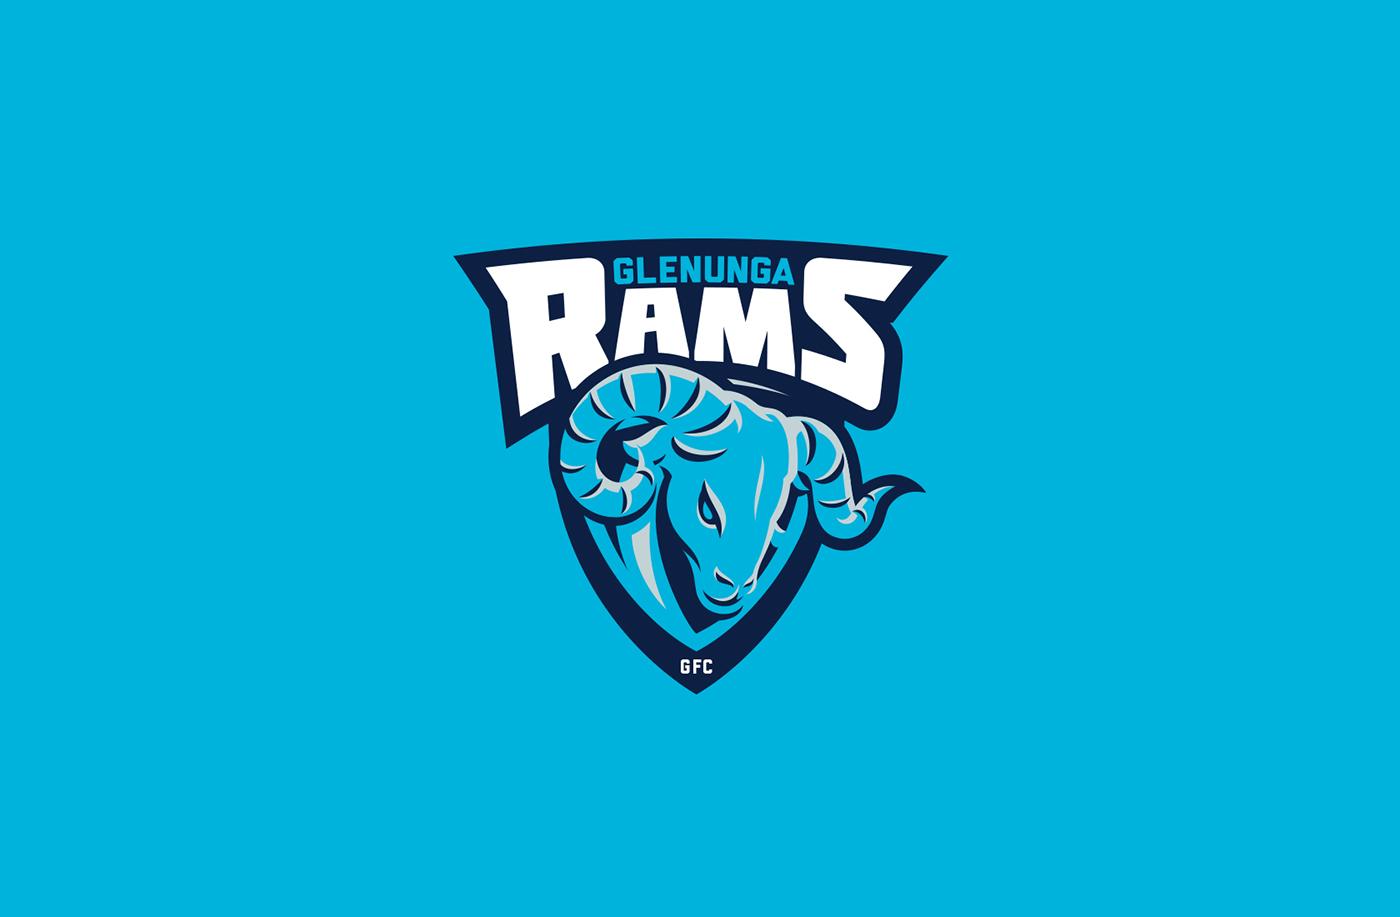 rams football club